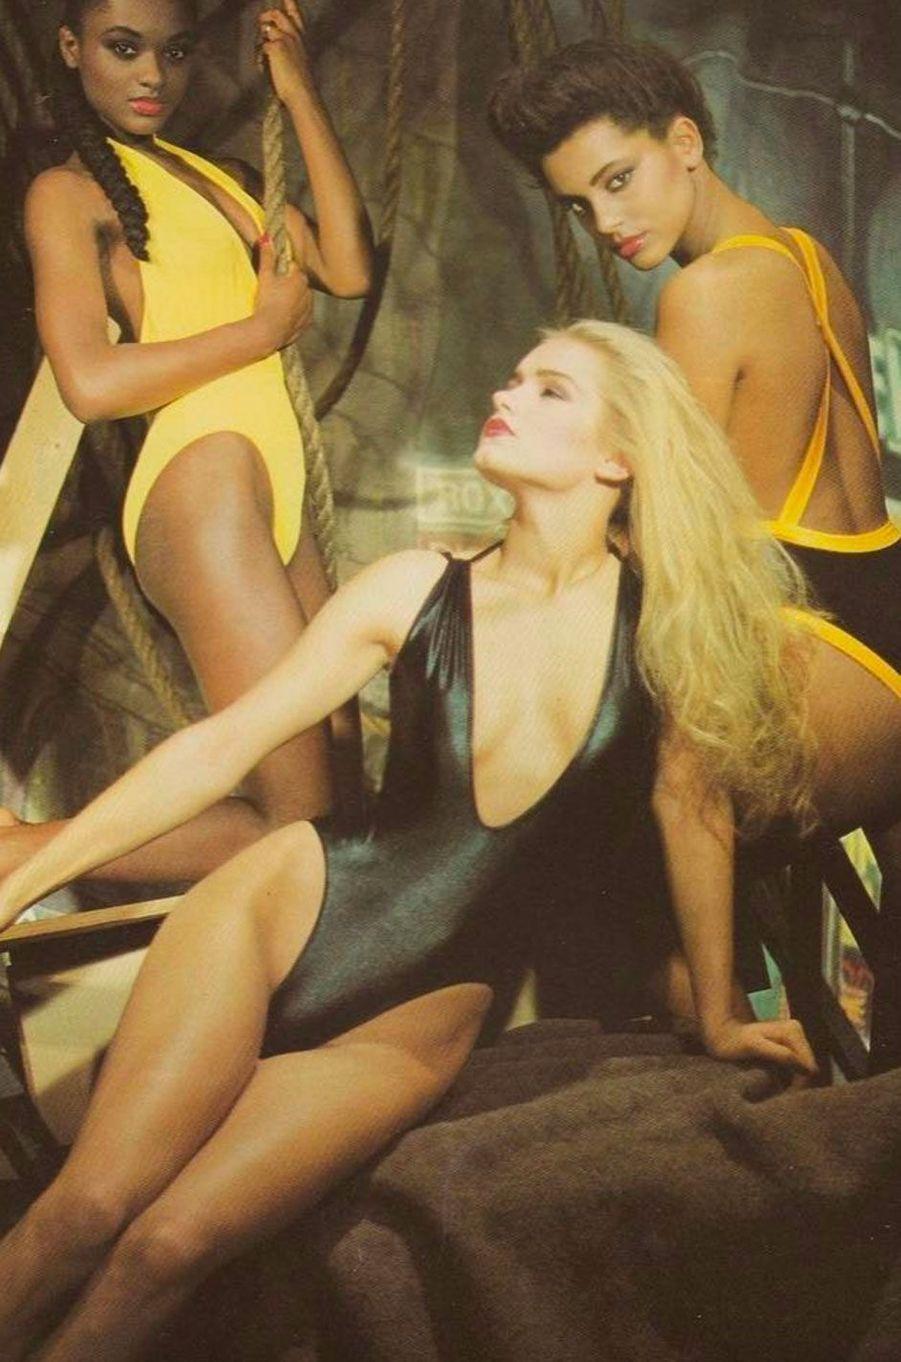 Yolanda Hadid dans les années 80